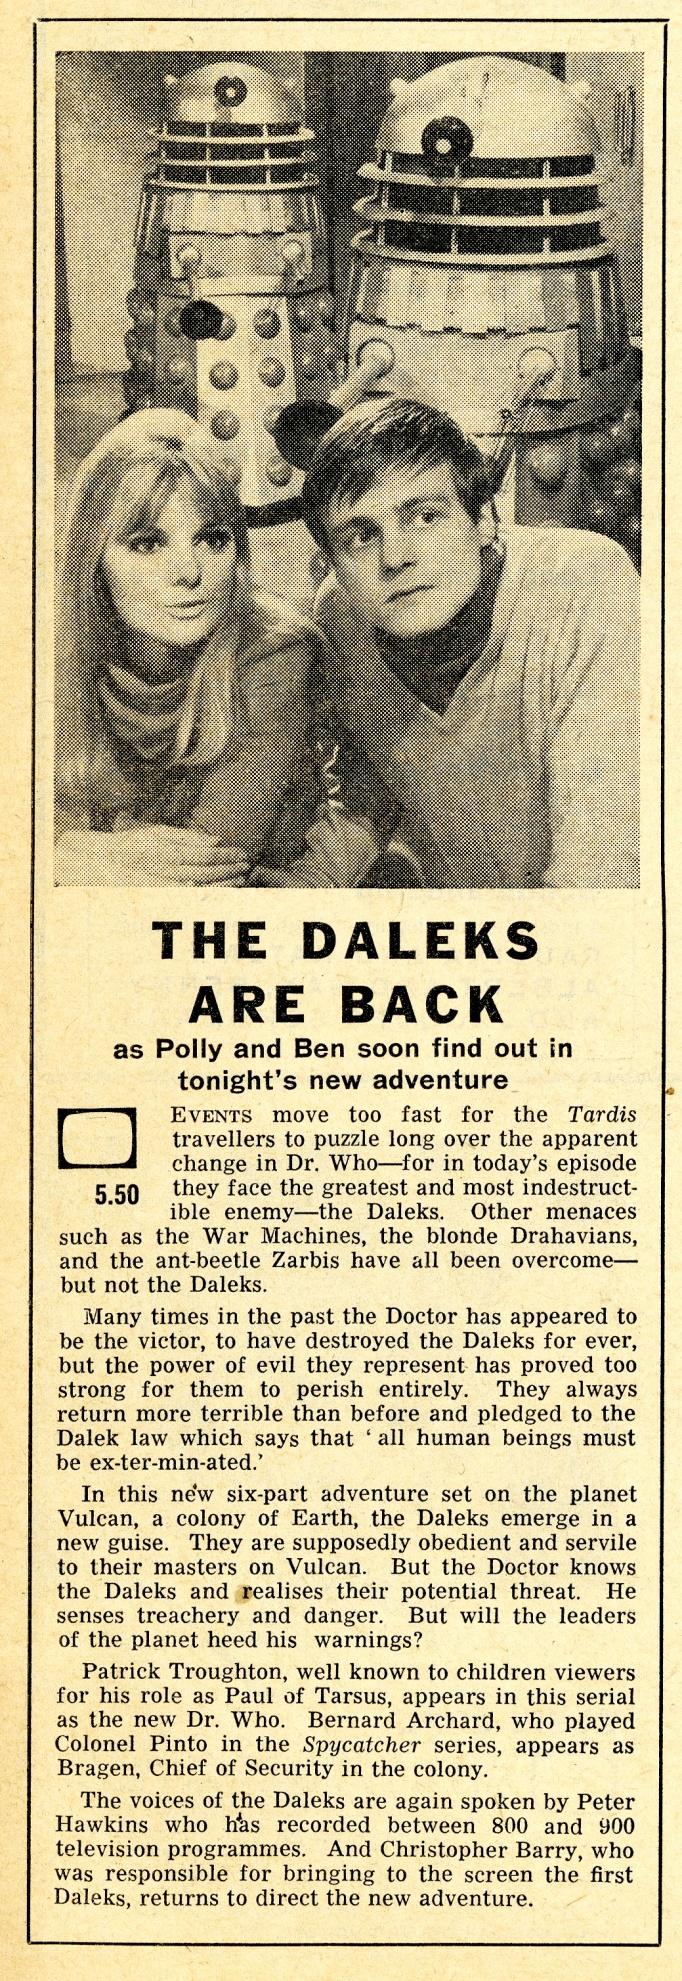 Radio Times, 5-11 November 1966